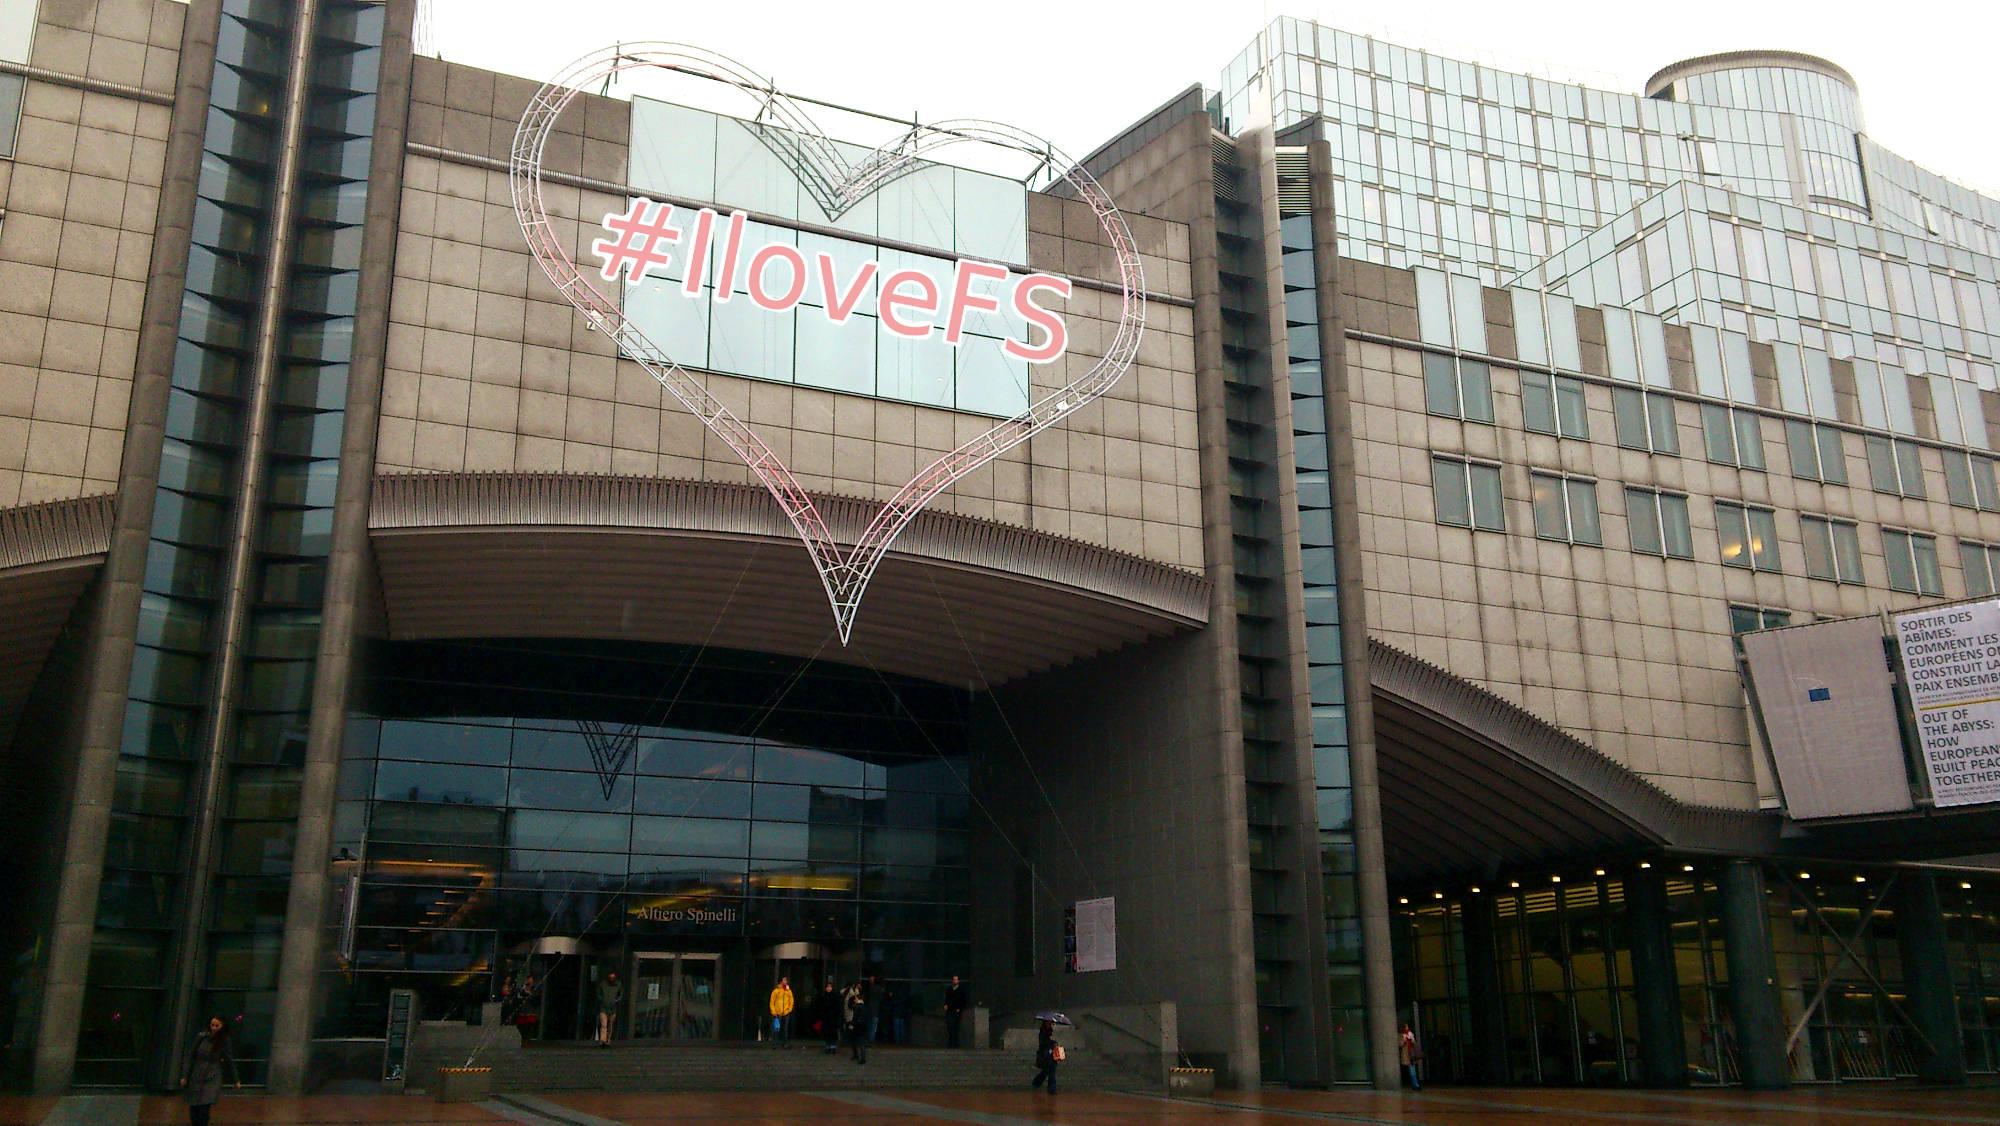 European Parliament celebrating #IloveFS